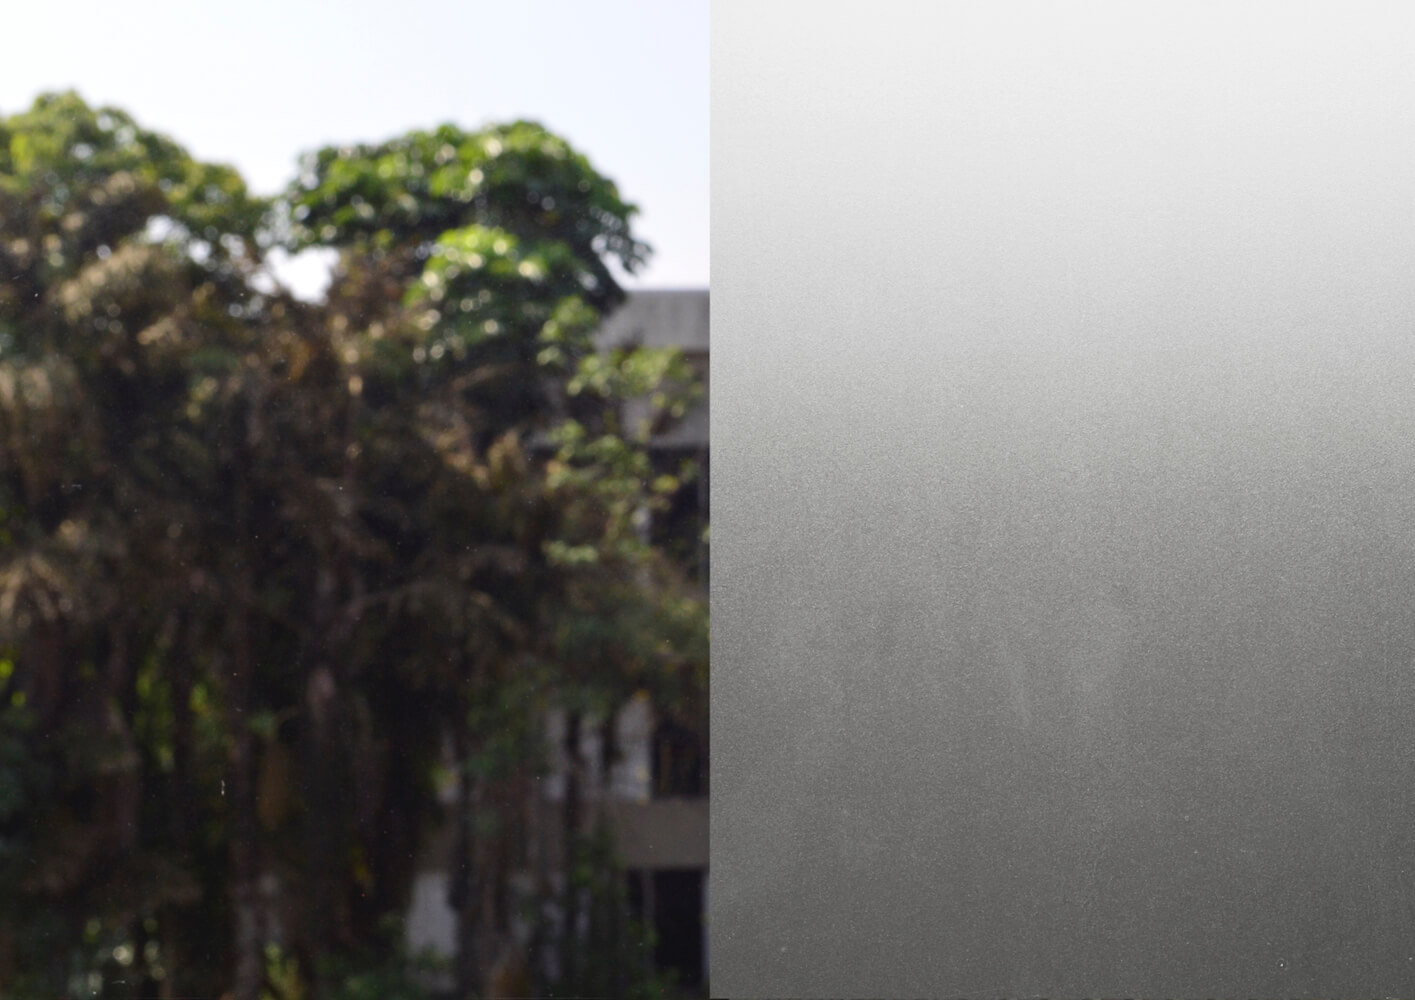 Adesivo para Vidro Transparente Color Jateado